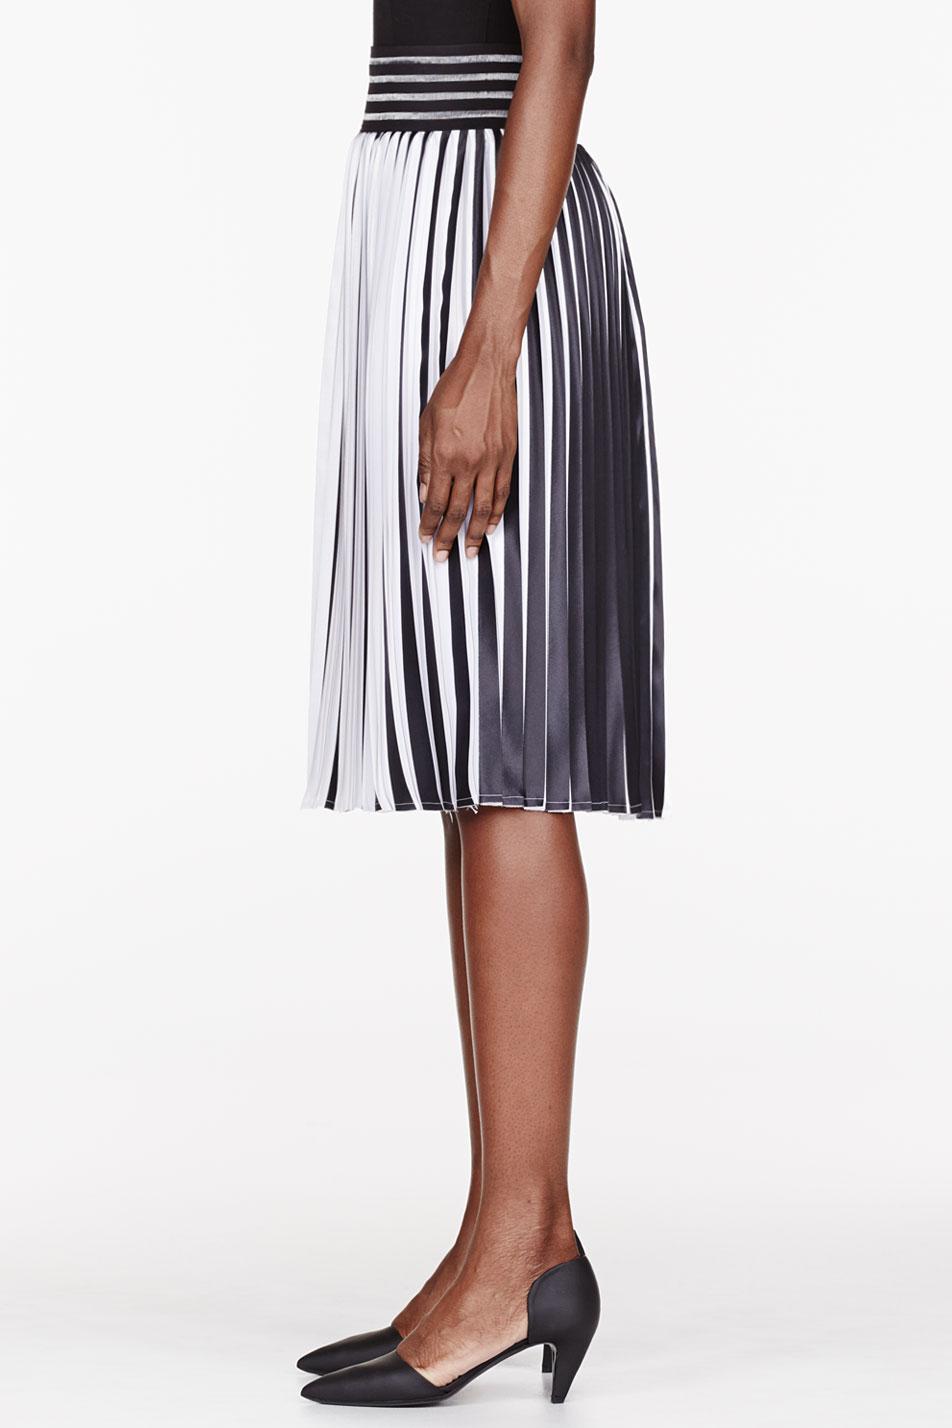 Christopher kane Black and White Pleated Skirt in Black | Lyst